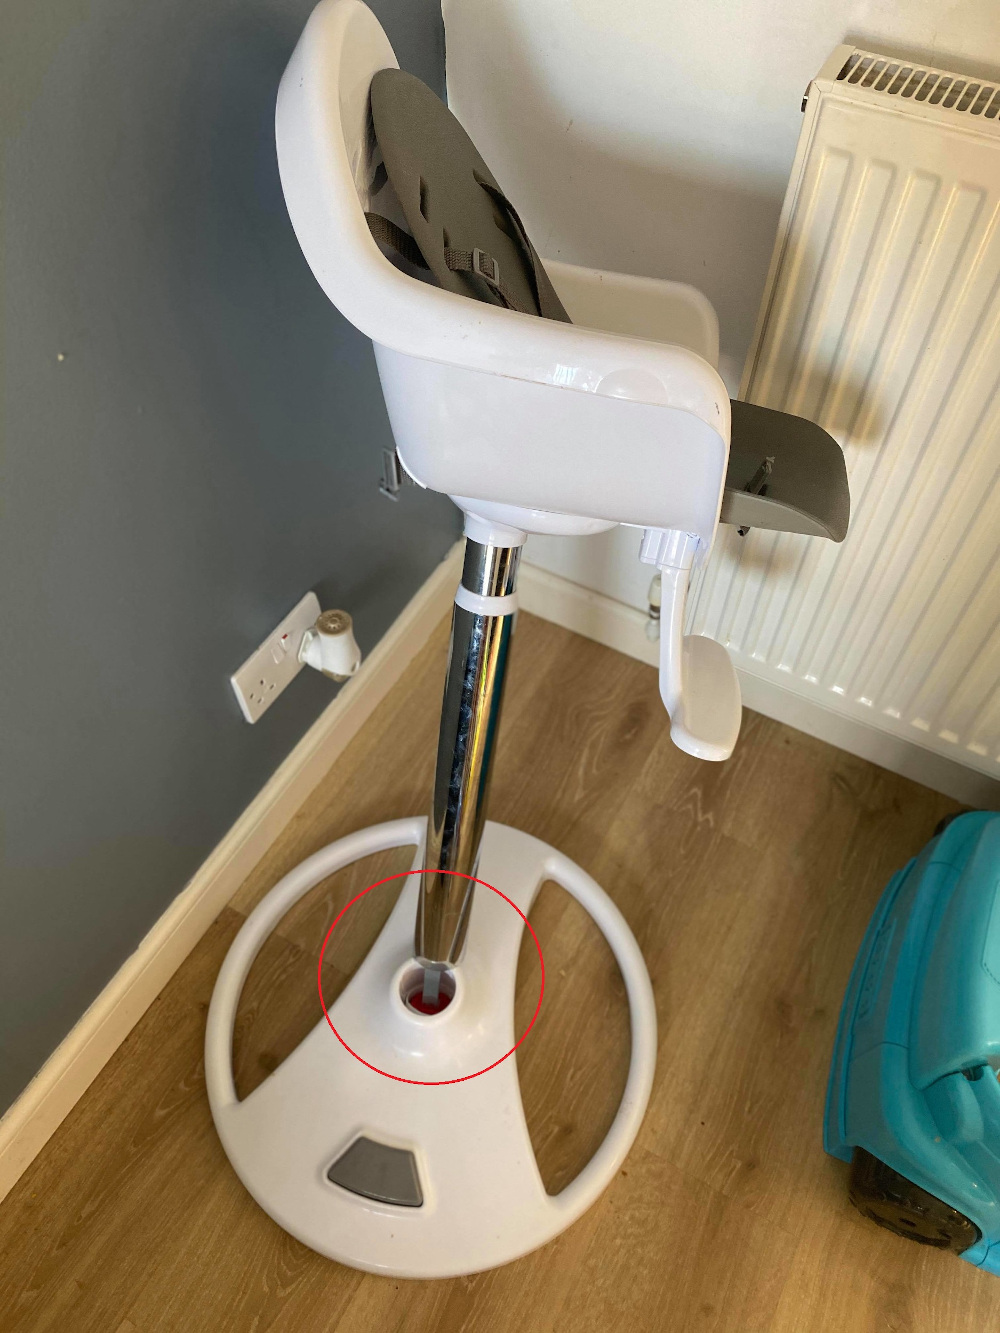 Aldi high chair breaks injuring baby